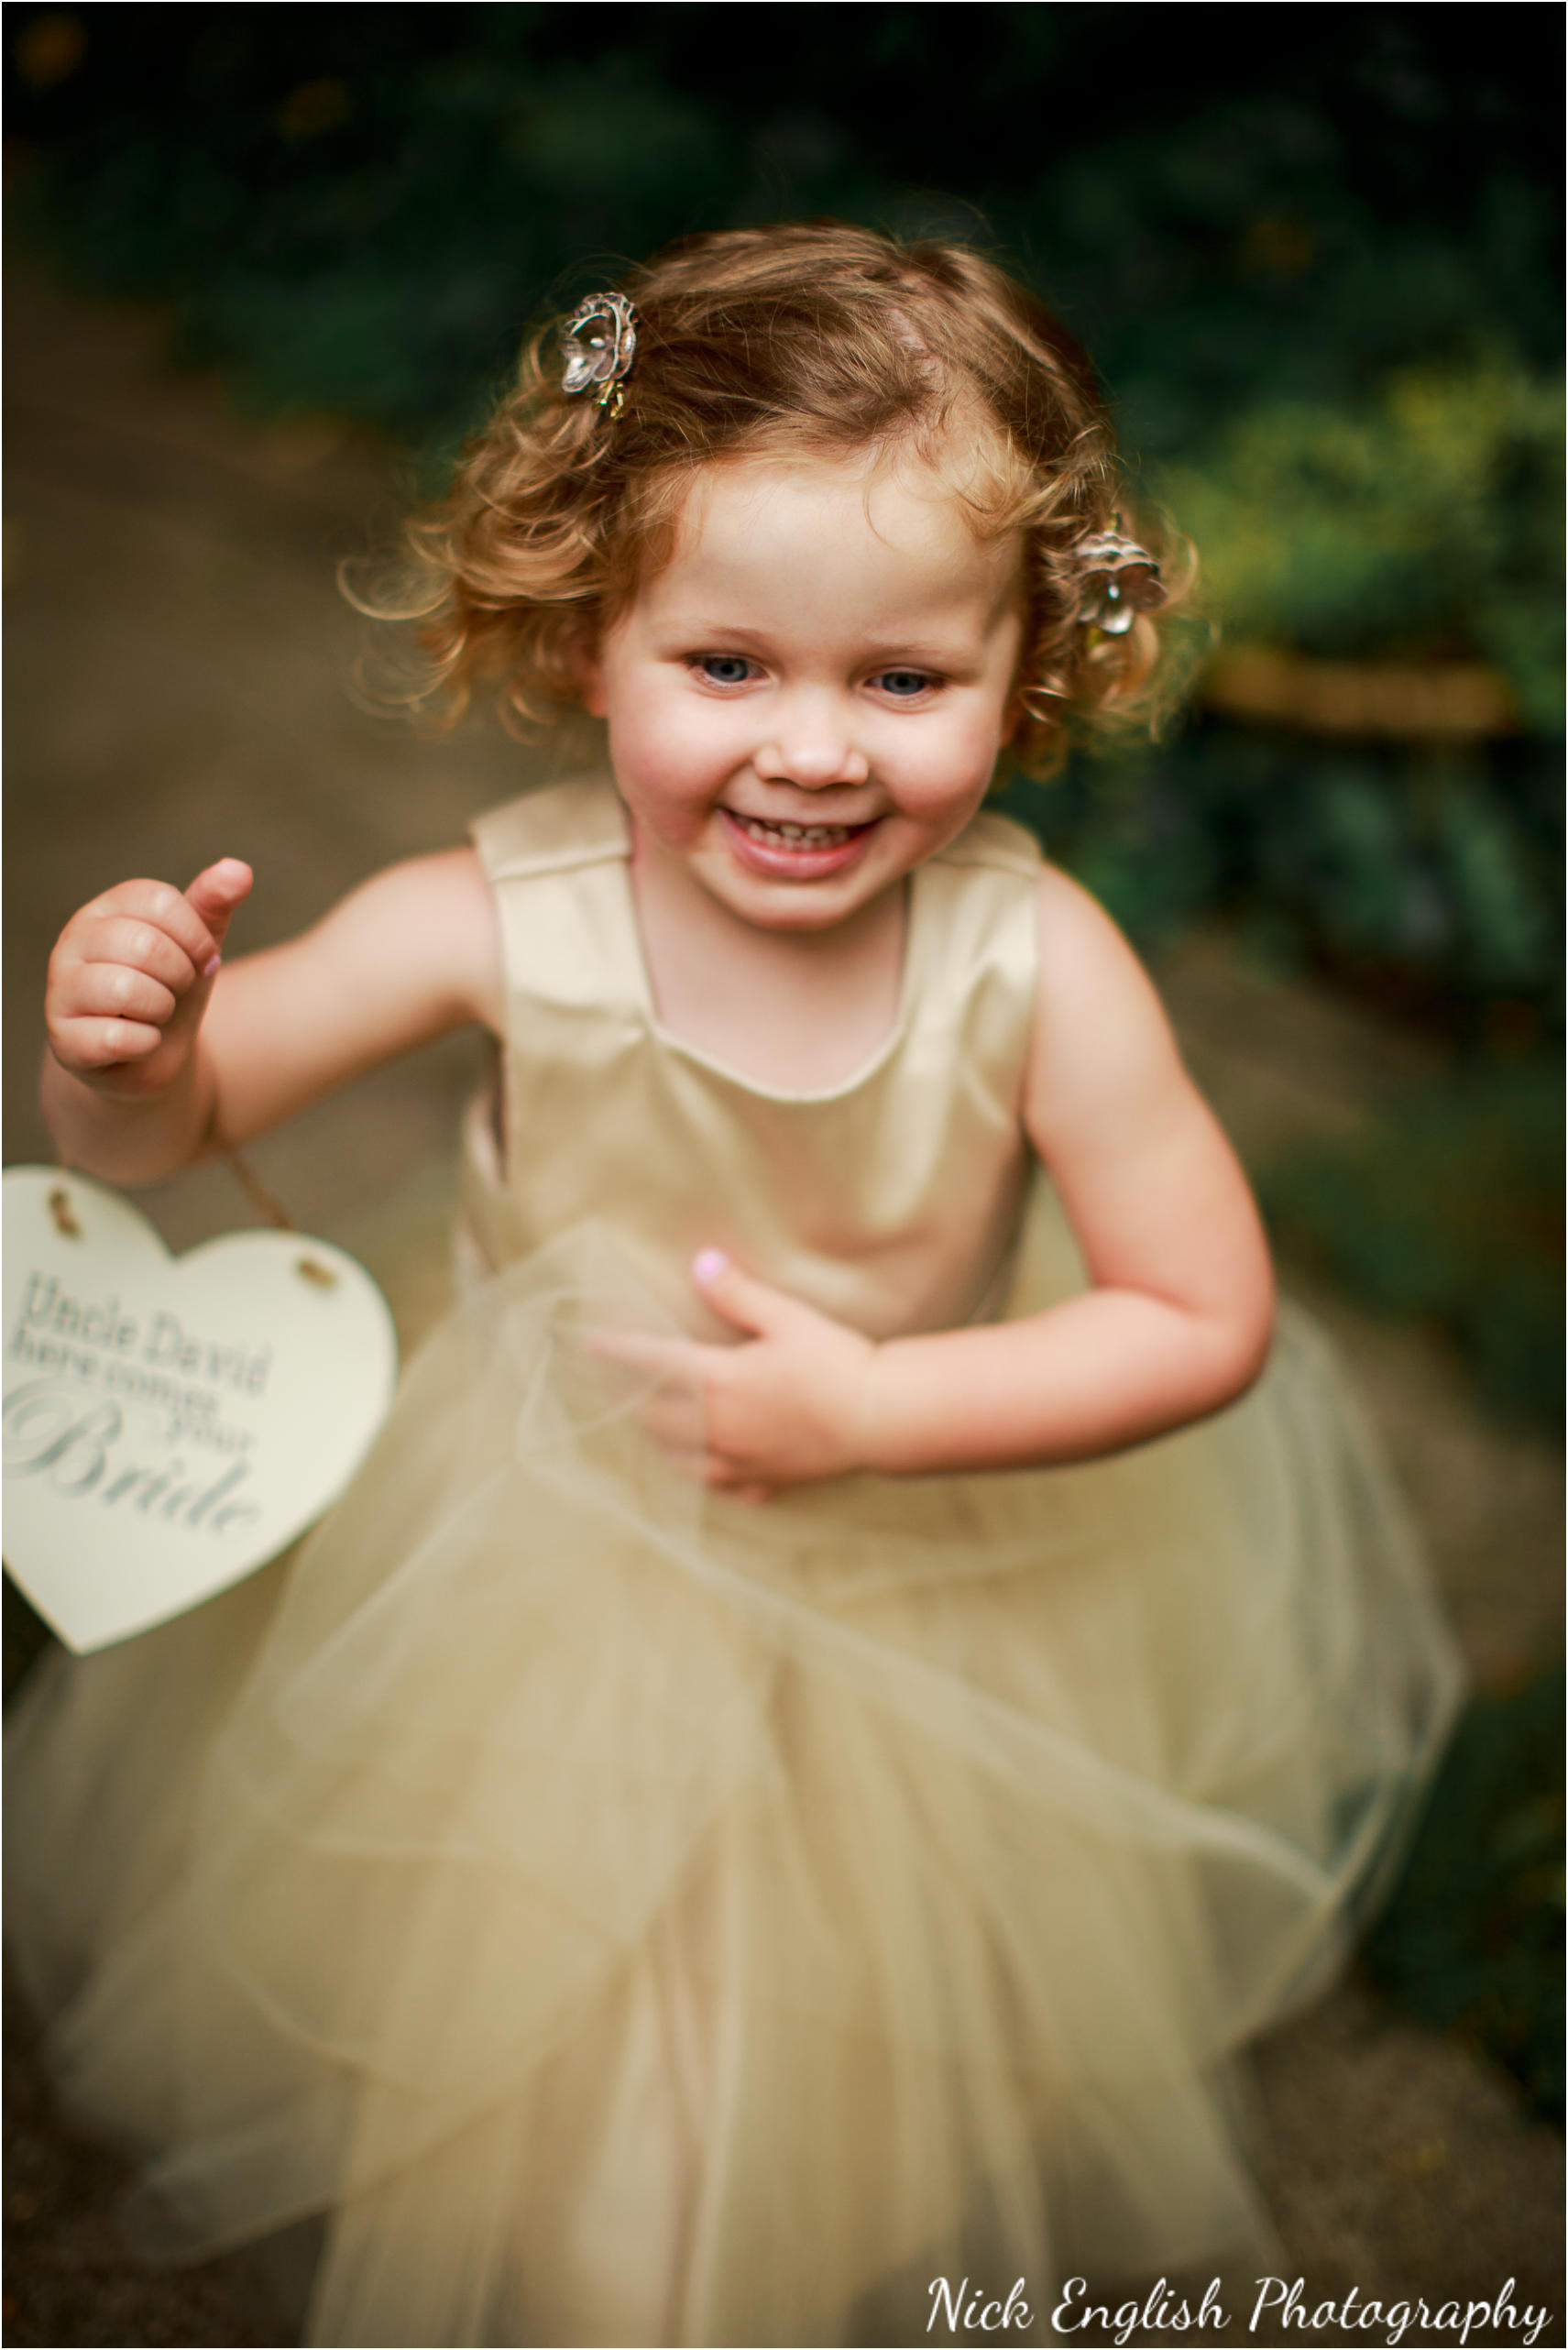 Emily David Wedding Photographs at Barton Grange Preston by Nick English Photography 125jpg.jpeg